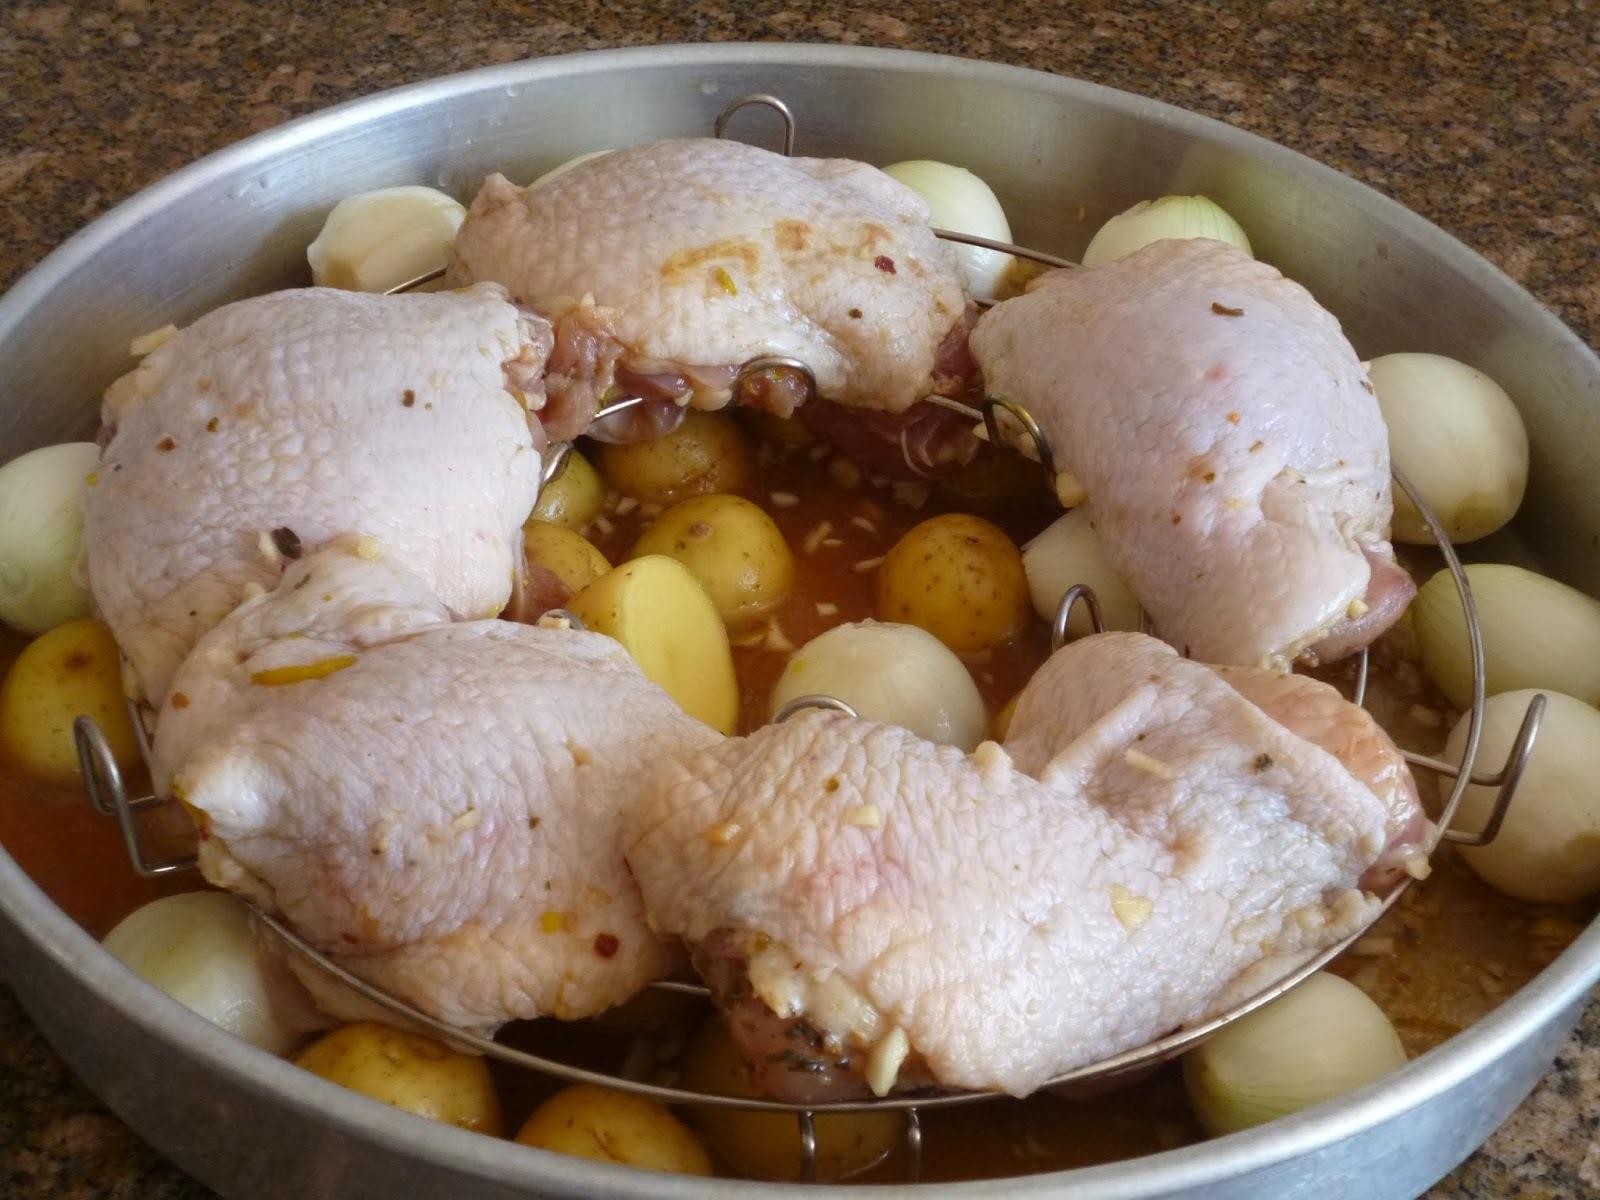 coxa de frango com farofa ana maria braga